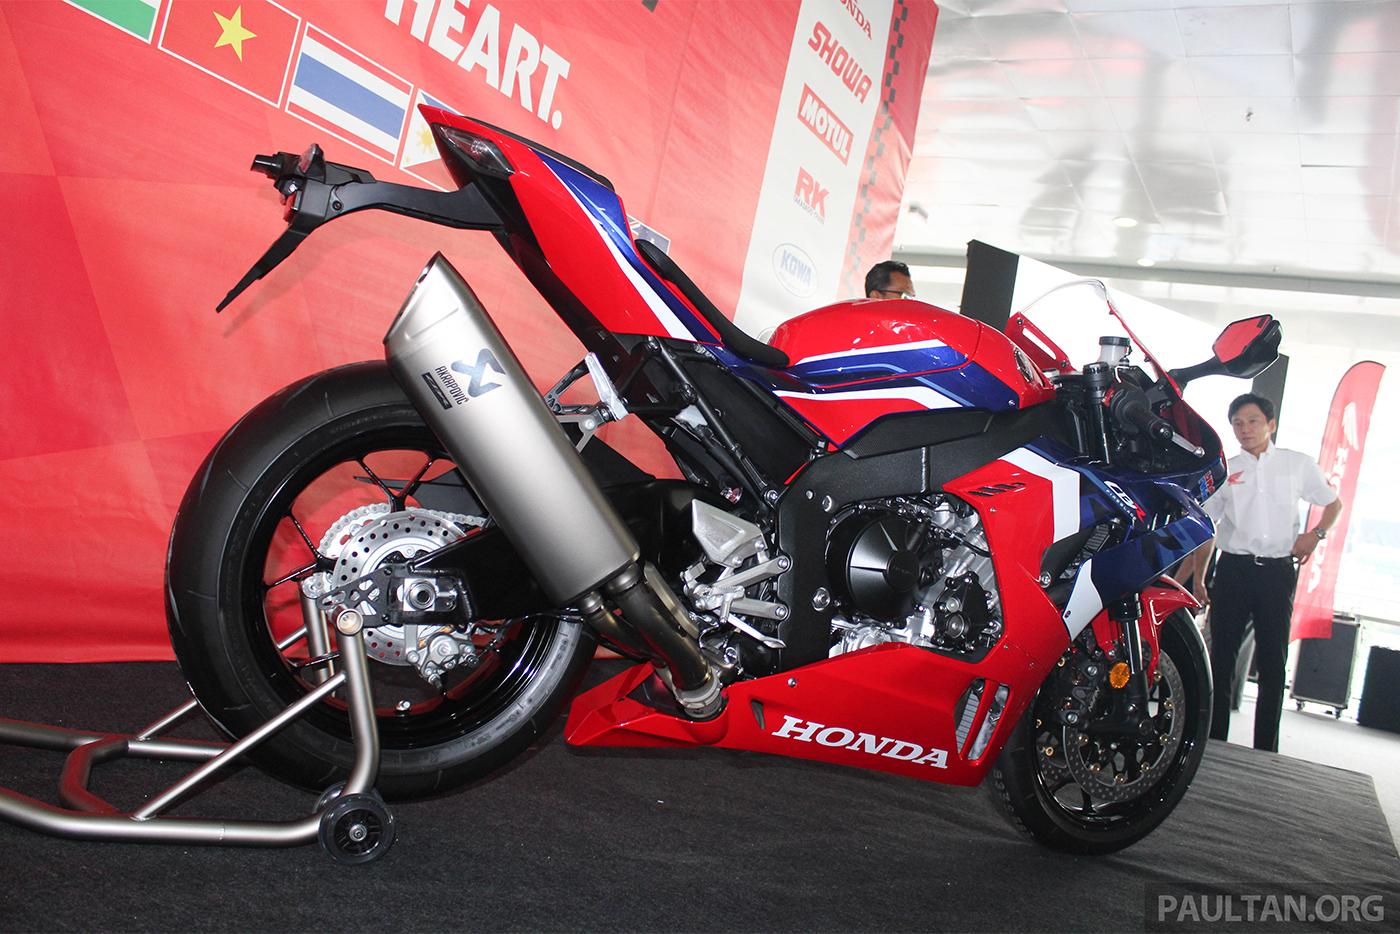 2020-honda-cbr1000rr-r-malaysia-watermark-16.jpg